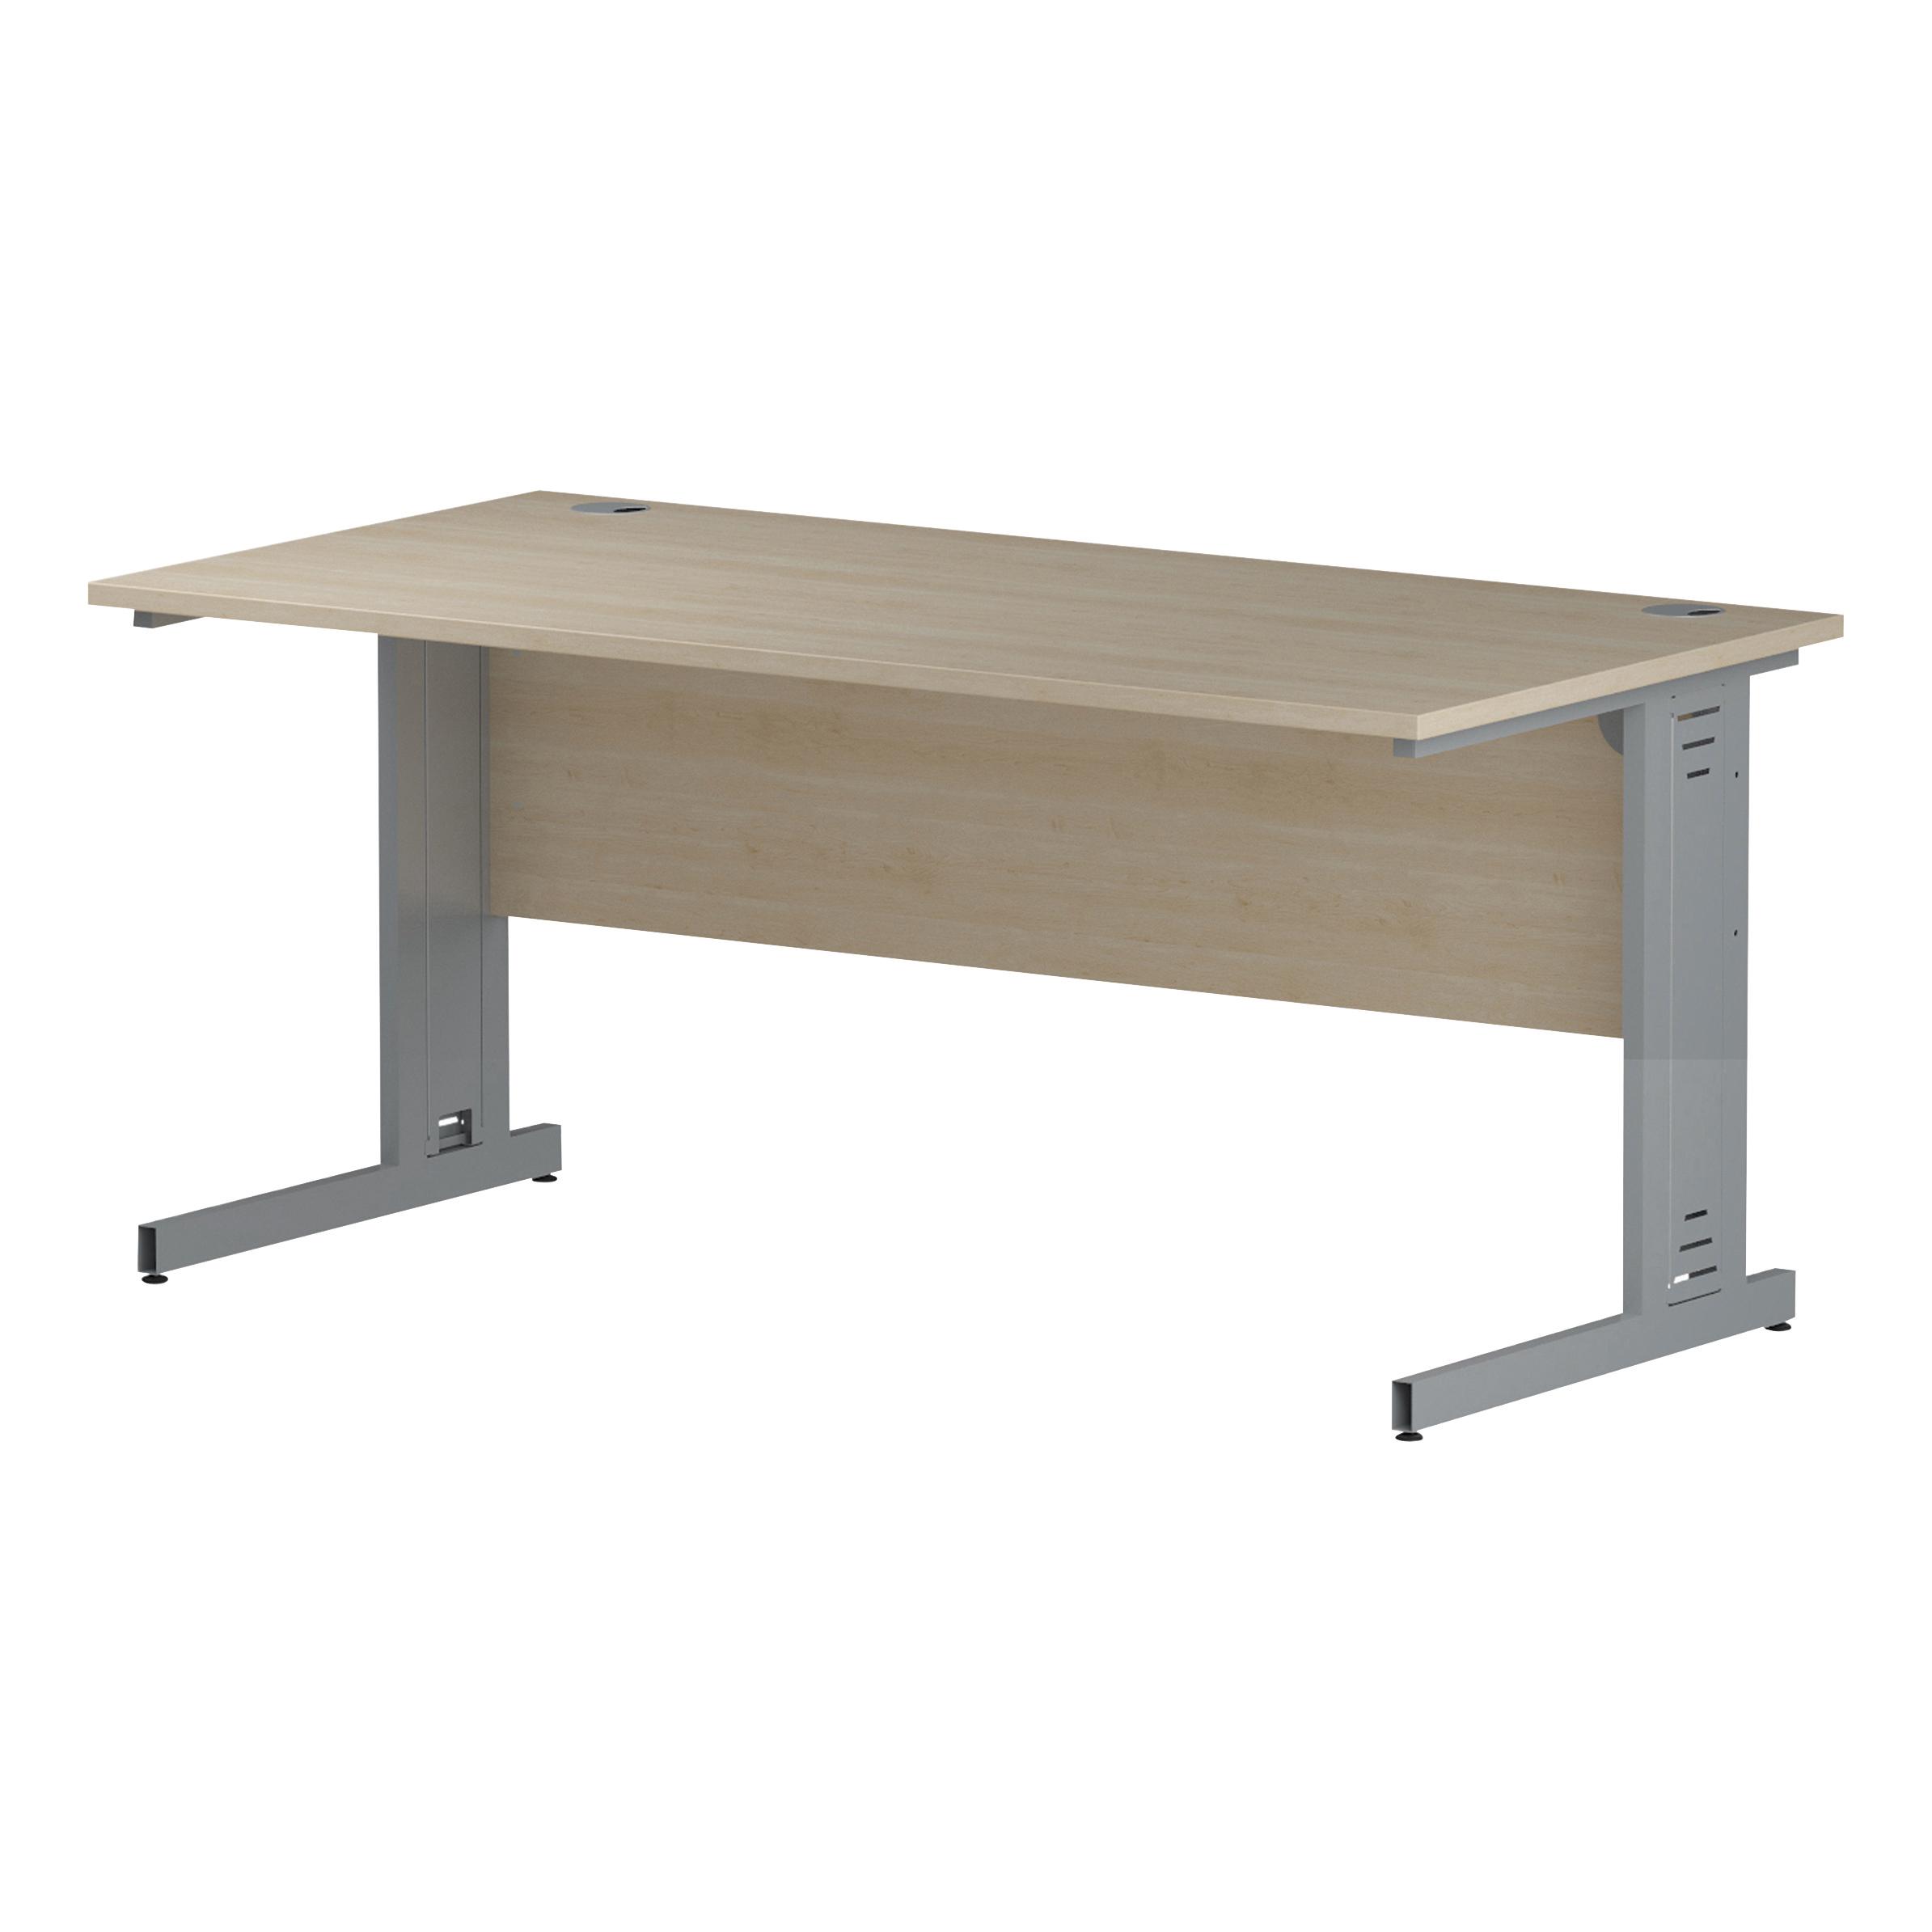 Trexus Rectangular Desk Silver Cable Managed Leg 1600x800mm Maple Ref I000518